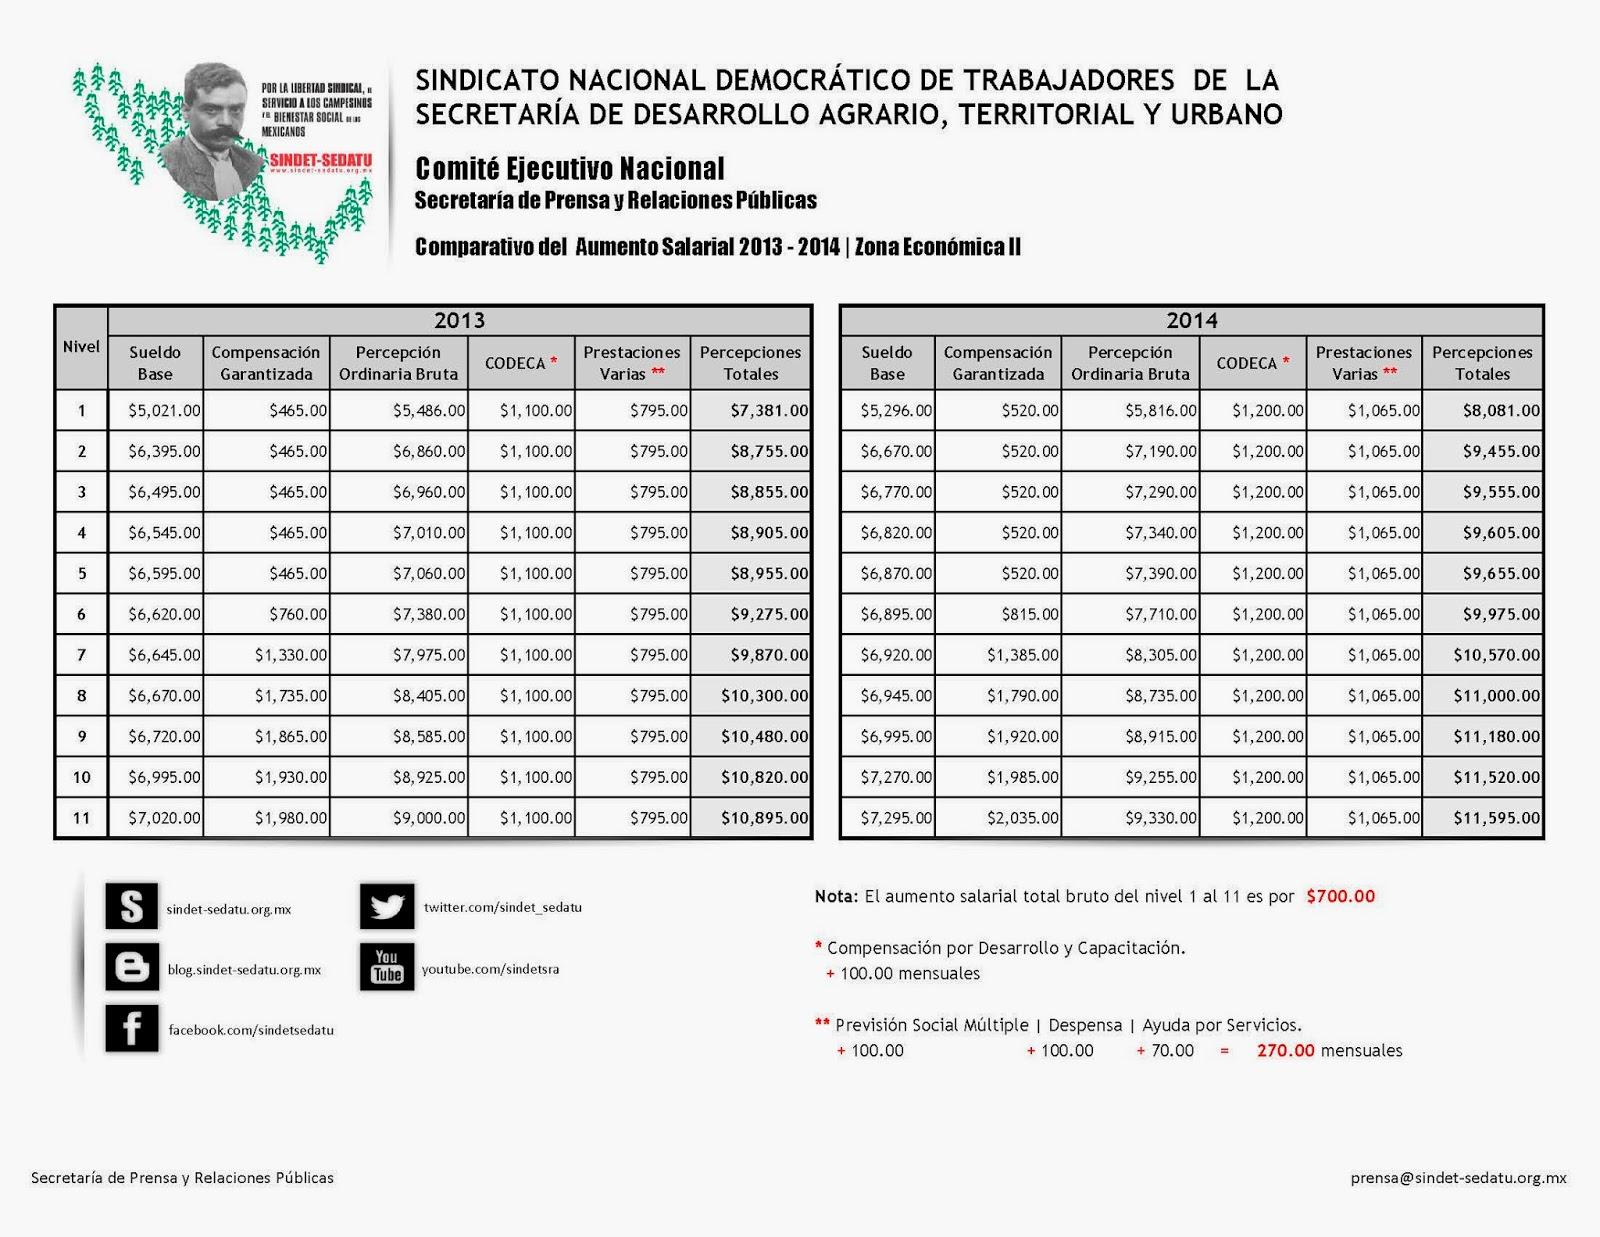 http://sindet-sedatu.org.mx/web/doctos/Comparativo_Tabulador_2013-2014.pdf